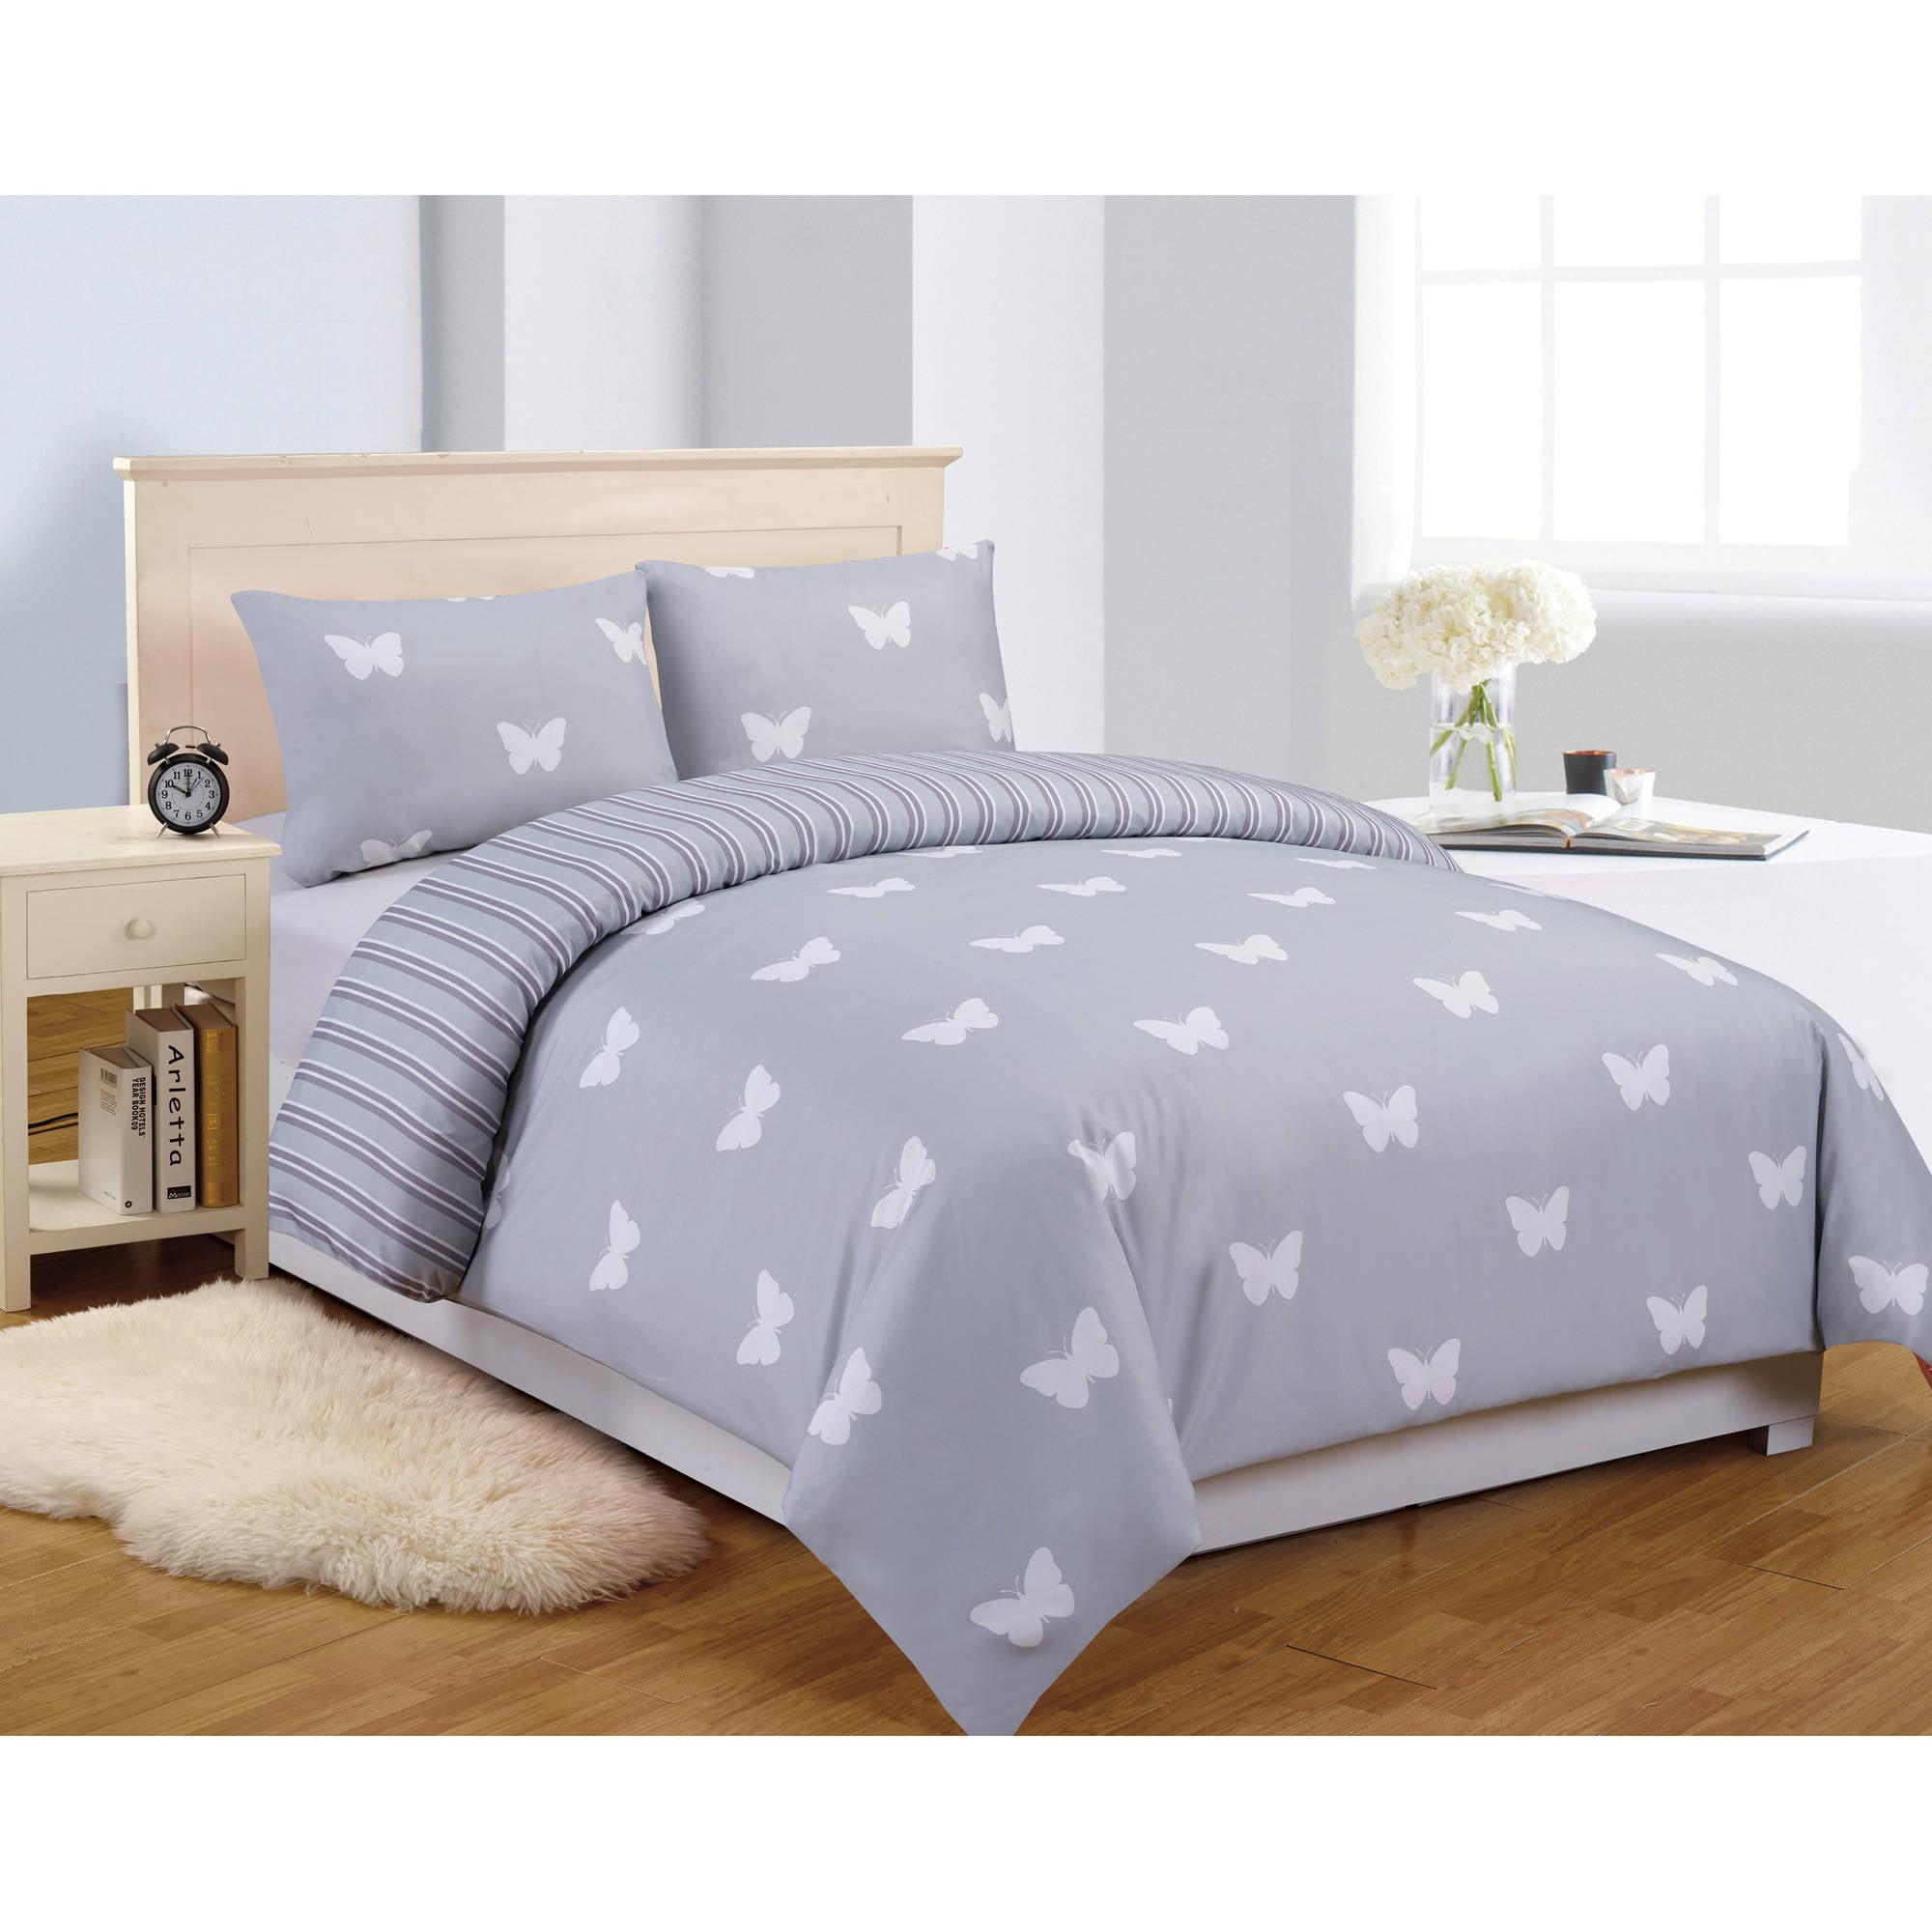 Wink Butterfly 3 Piece Full Comforter Set in Grey